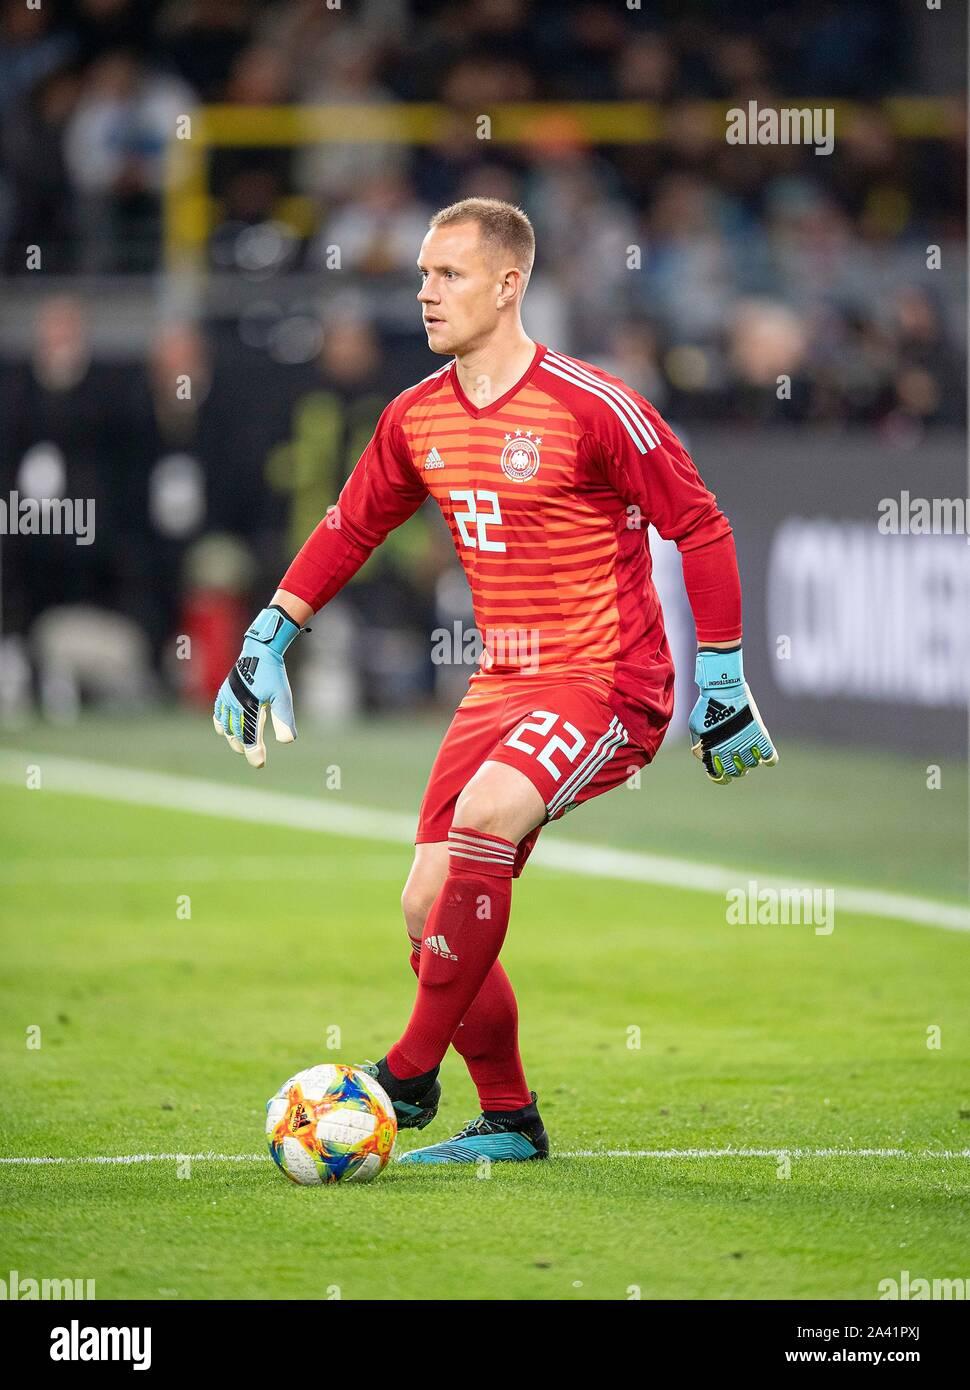 Goalkeeper Marc-Andre TER STEGEN (GER) Promotion, Football Laenderspiel, Friendly Match, Germany (GER) - Argentina (ARG) 2: 2, on 09/10/2019 in Dortmund / Germany. ¬ | usage worldwide Stock Photo